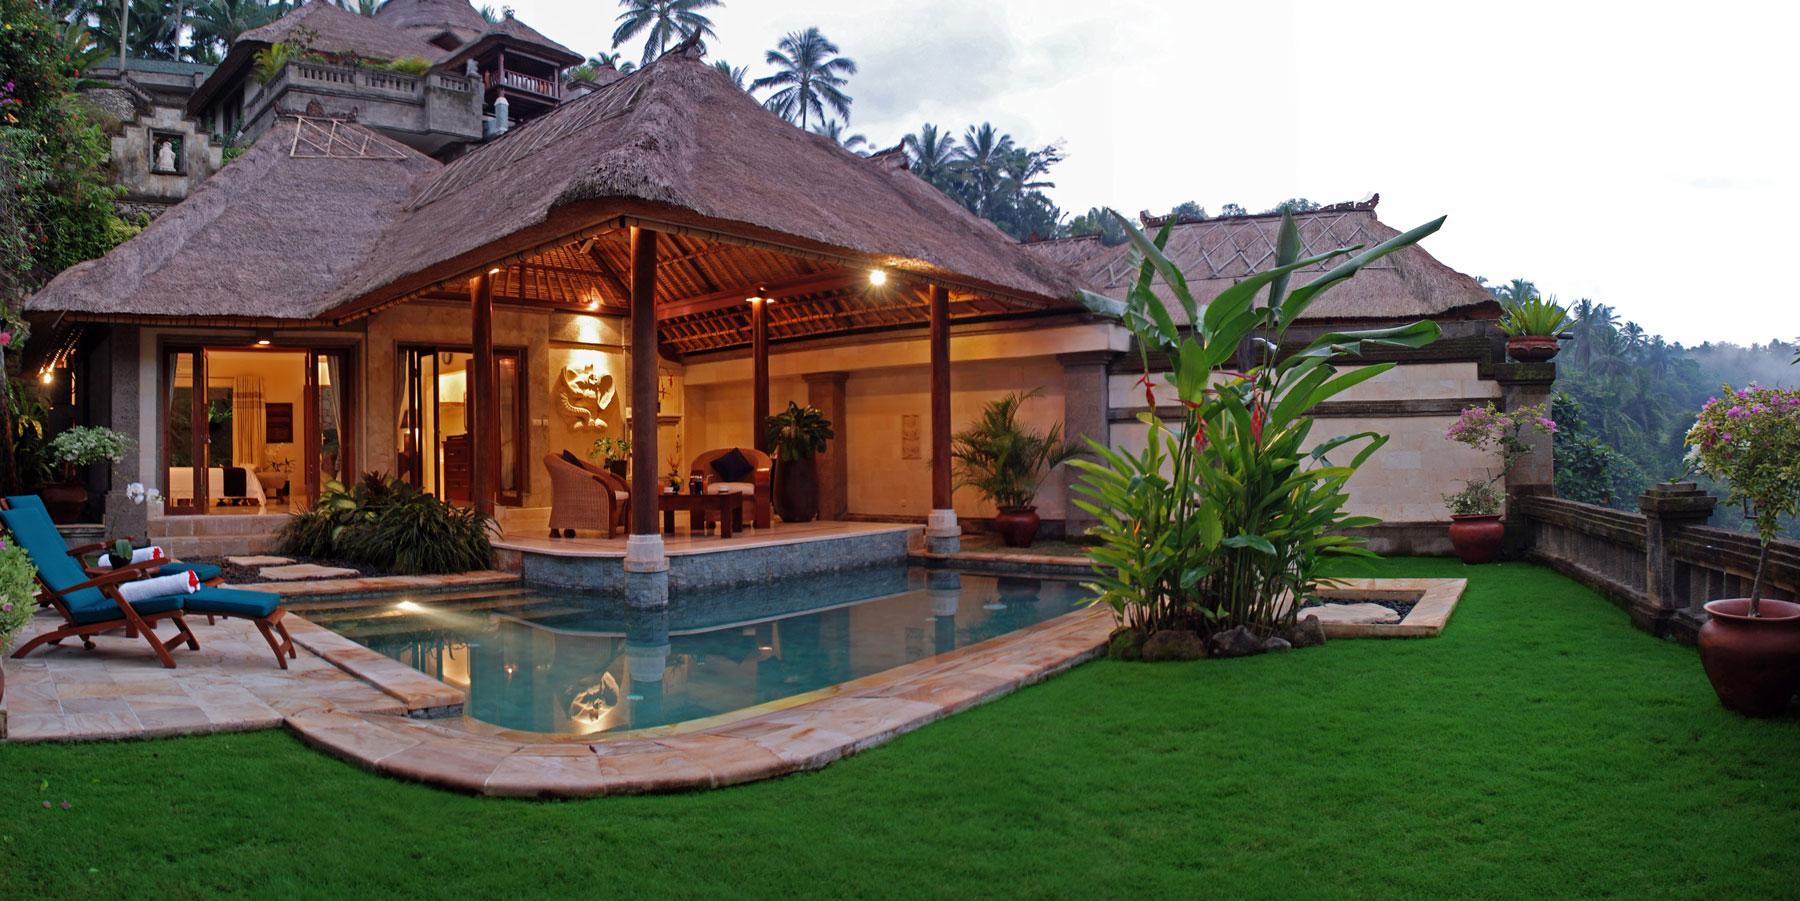 VICEROY BALI LUXURY VILLAS RESORT | 5 STARS HOTELS BALI ...